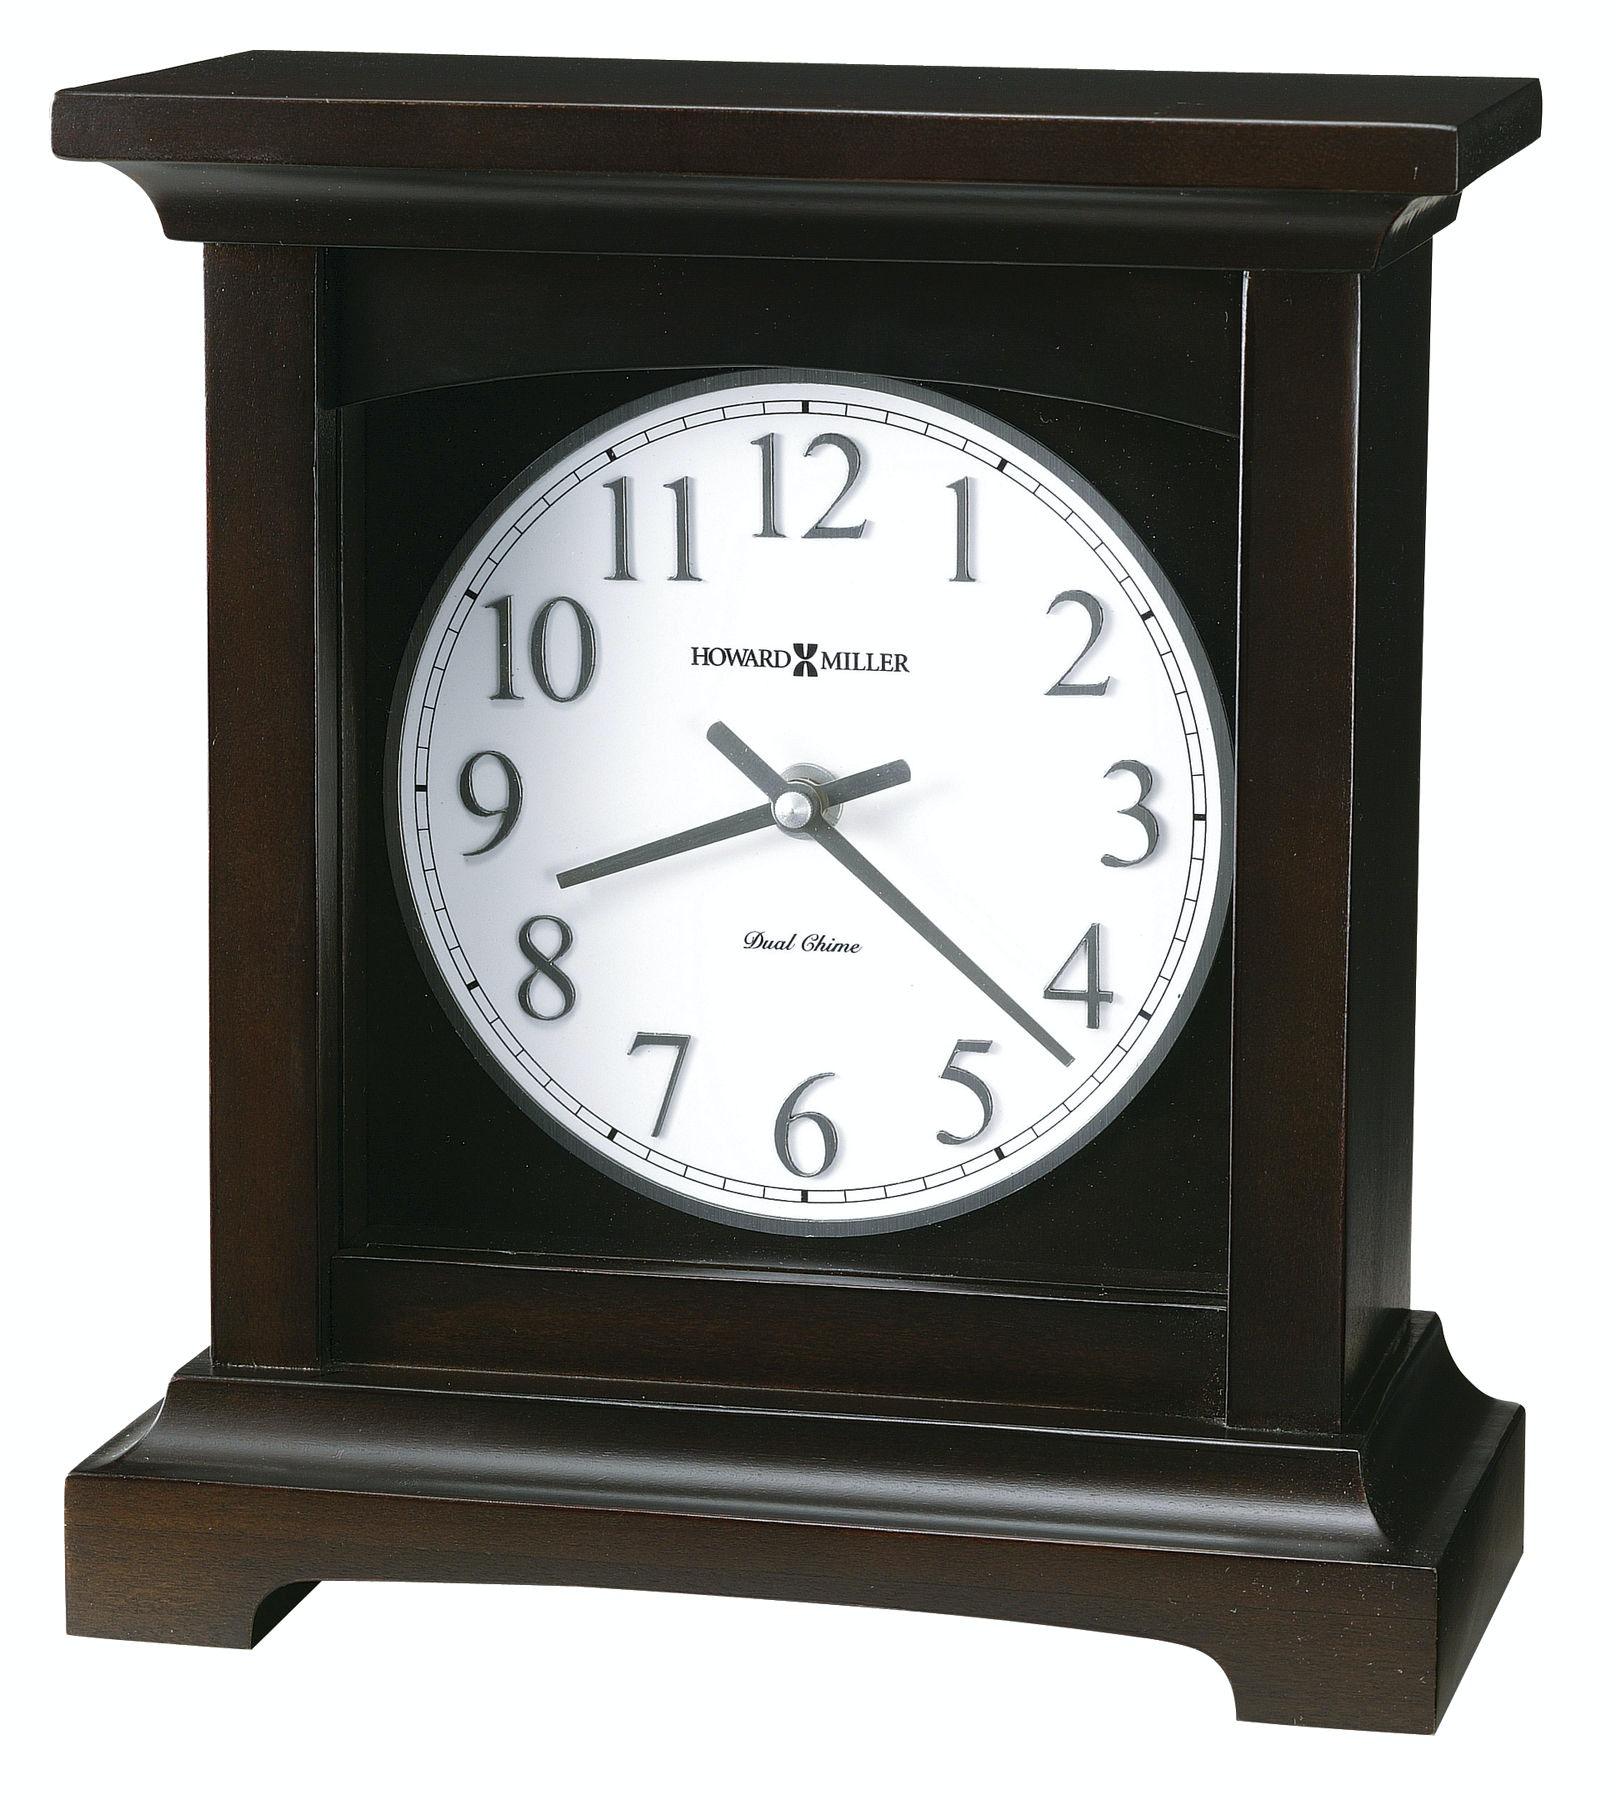 Mantel Urban Clock Ii Kq630246 EH9IDYe2W